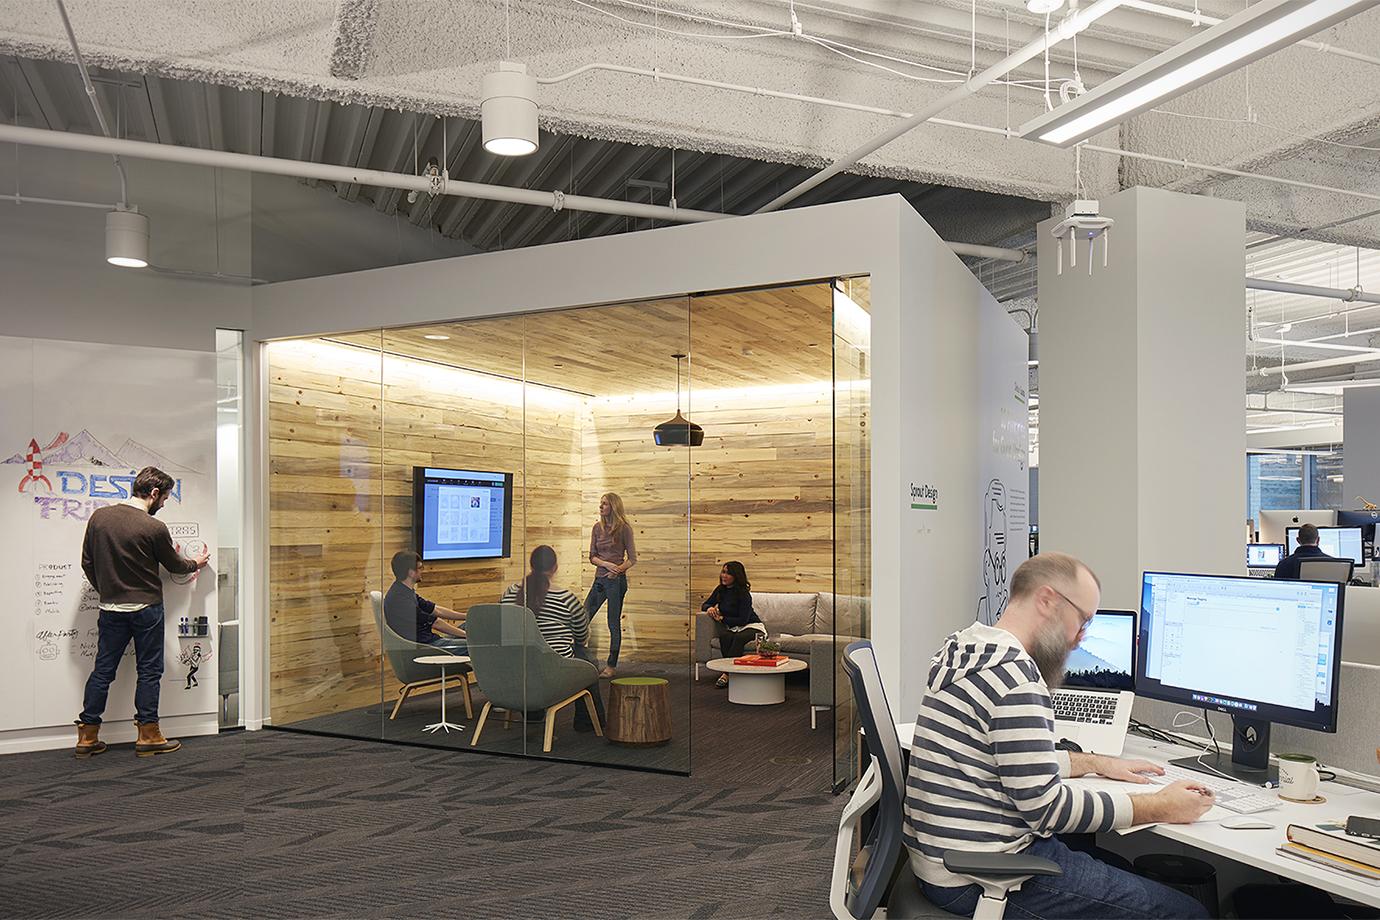 Scene of people working in an office.